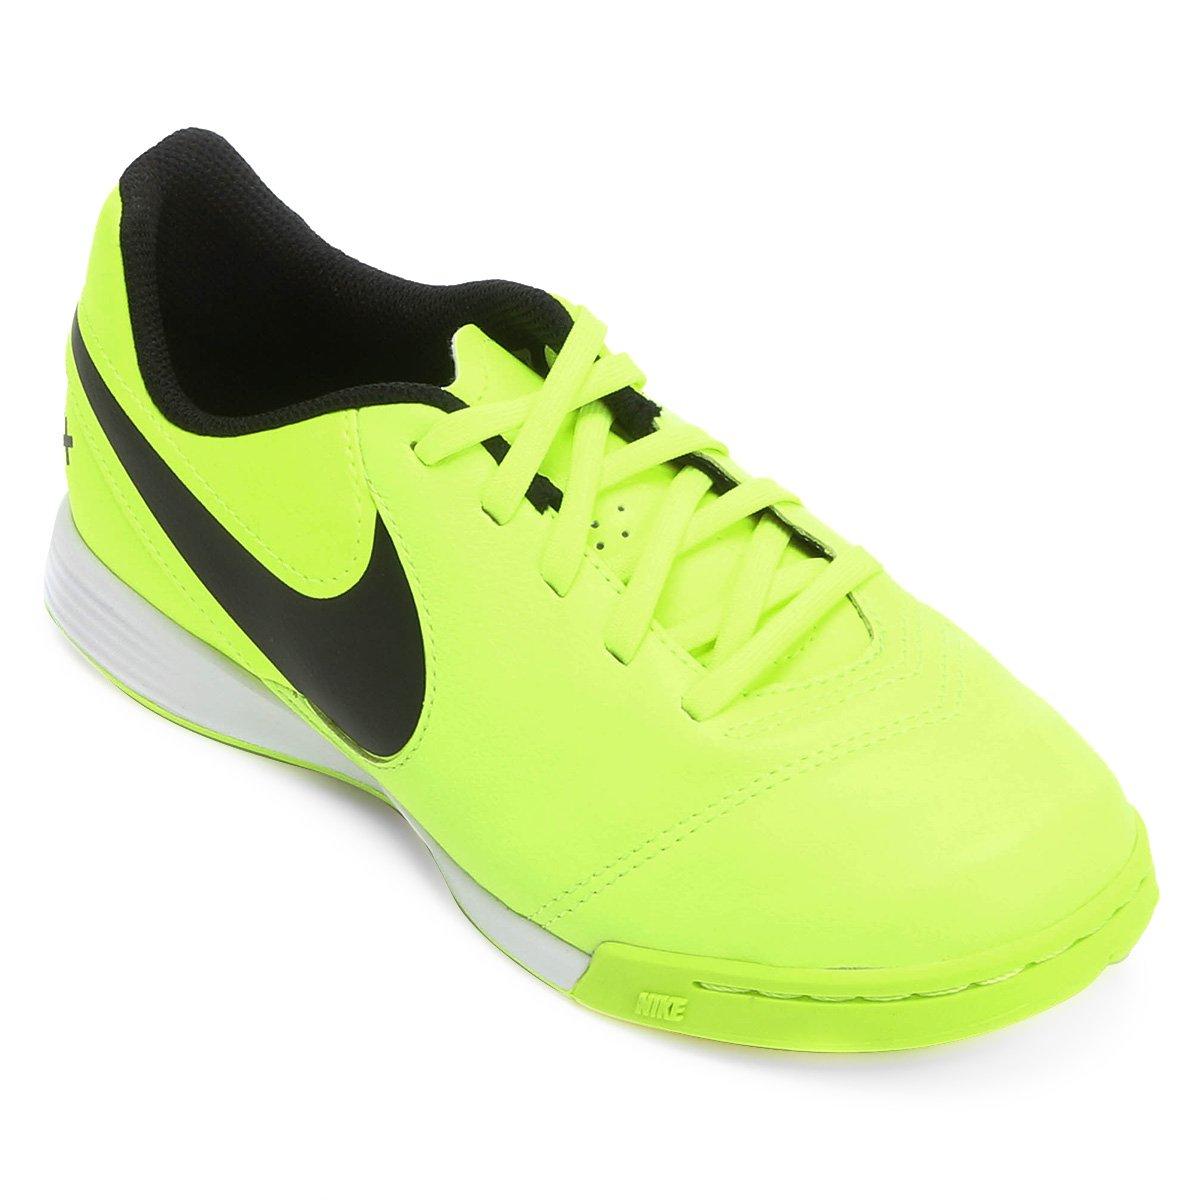 b78b8b4171 Chuteira Futsal Infantil Nike Tiempo Rio 3 IC - Compre Agora